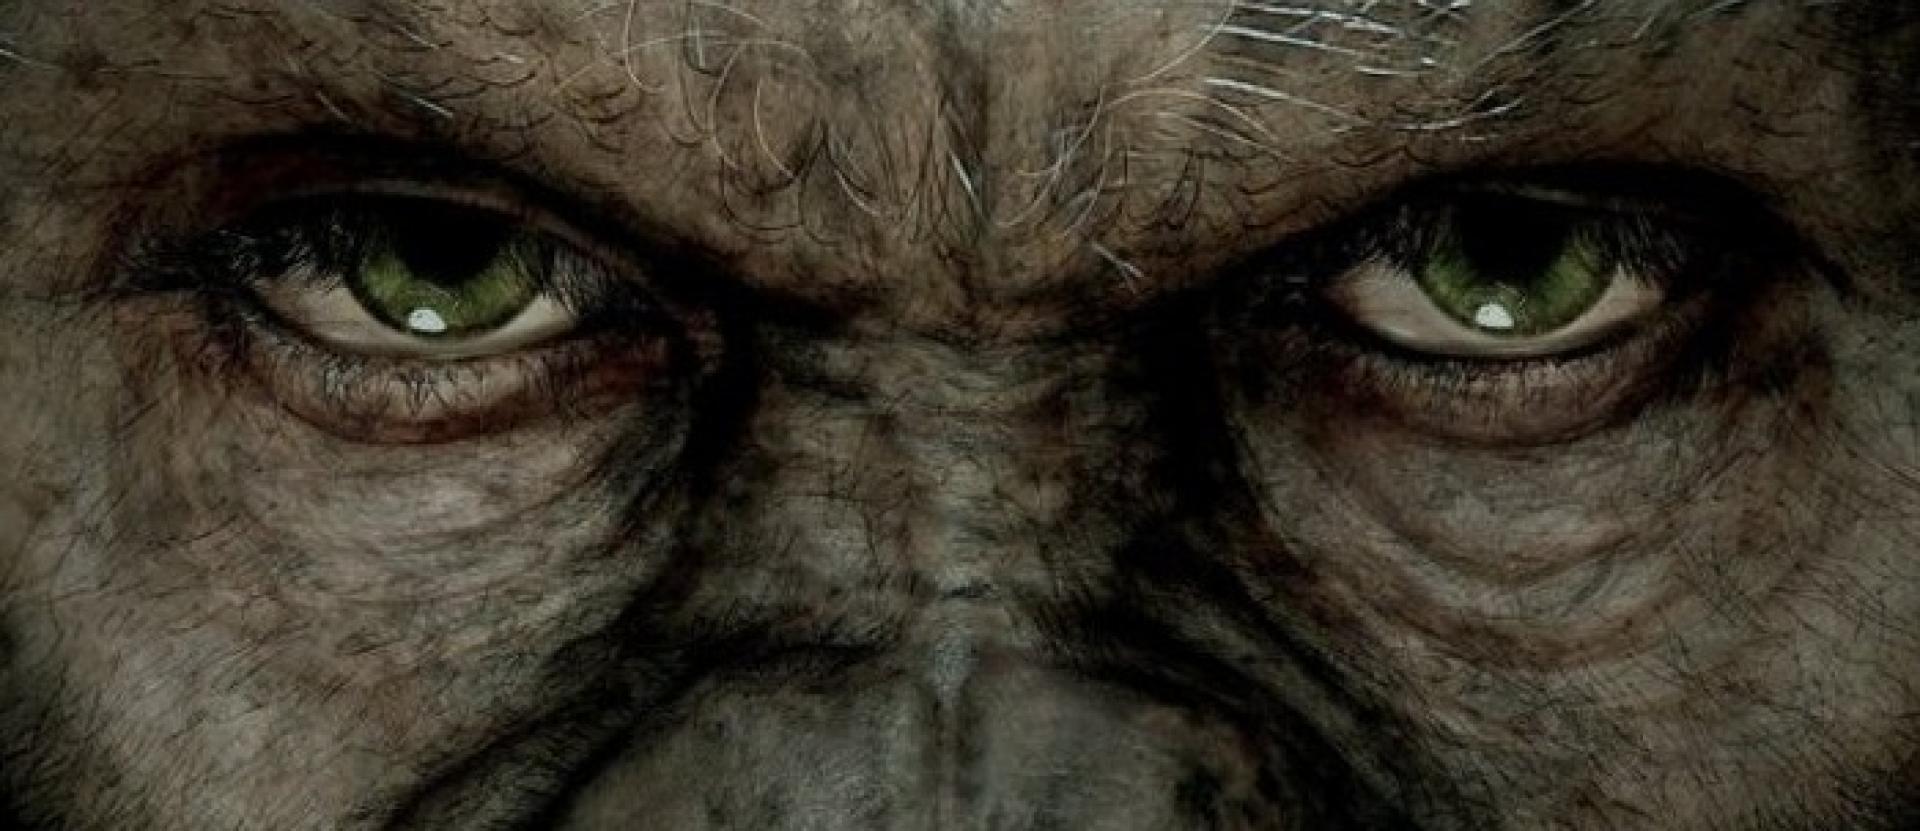 Rise of the Planet of the Apes - A majmok bolygója: Lázadás (2011)